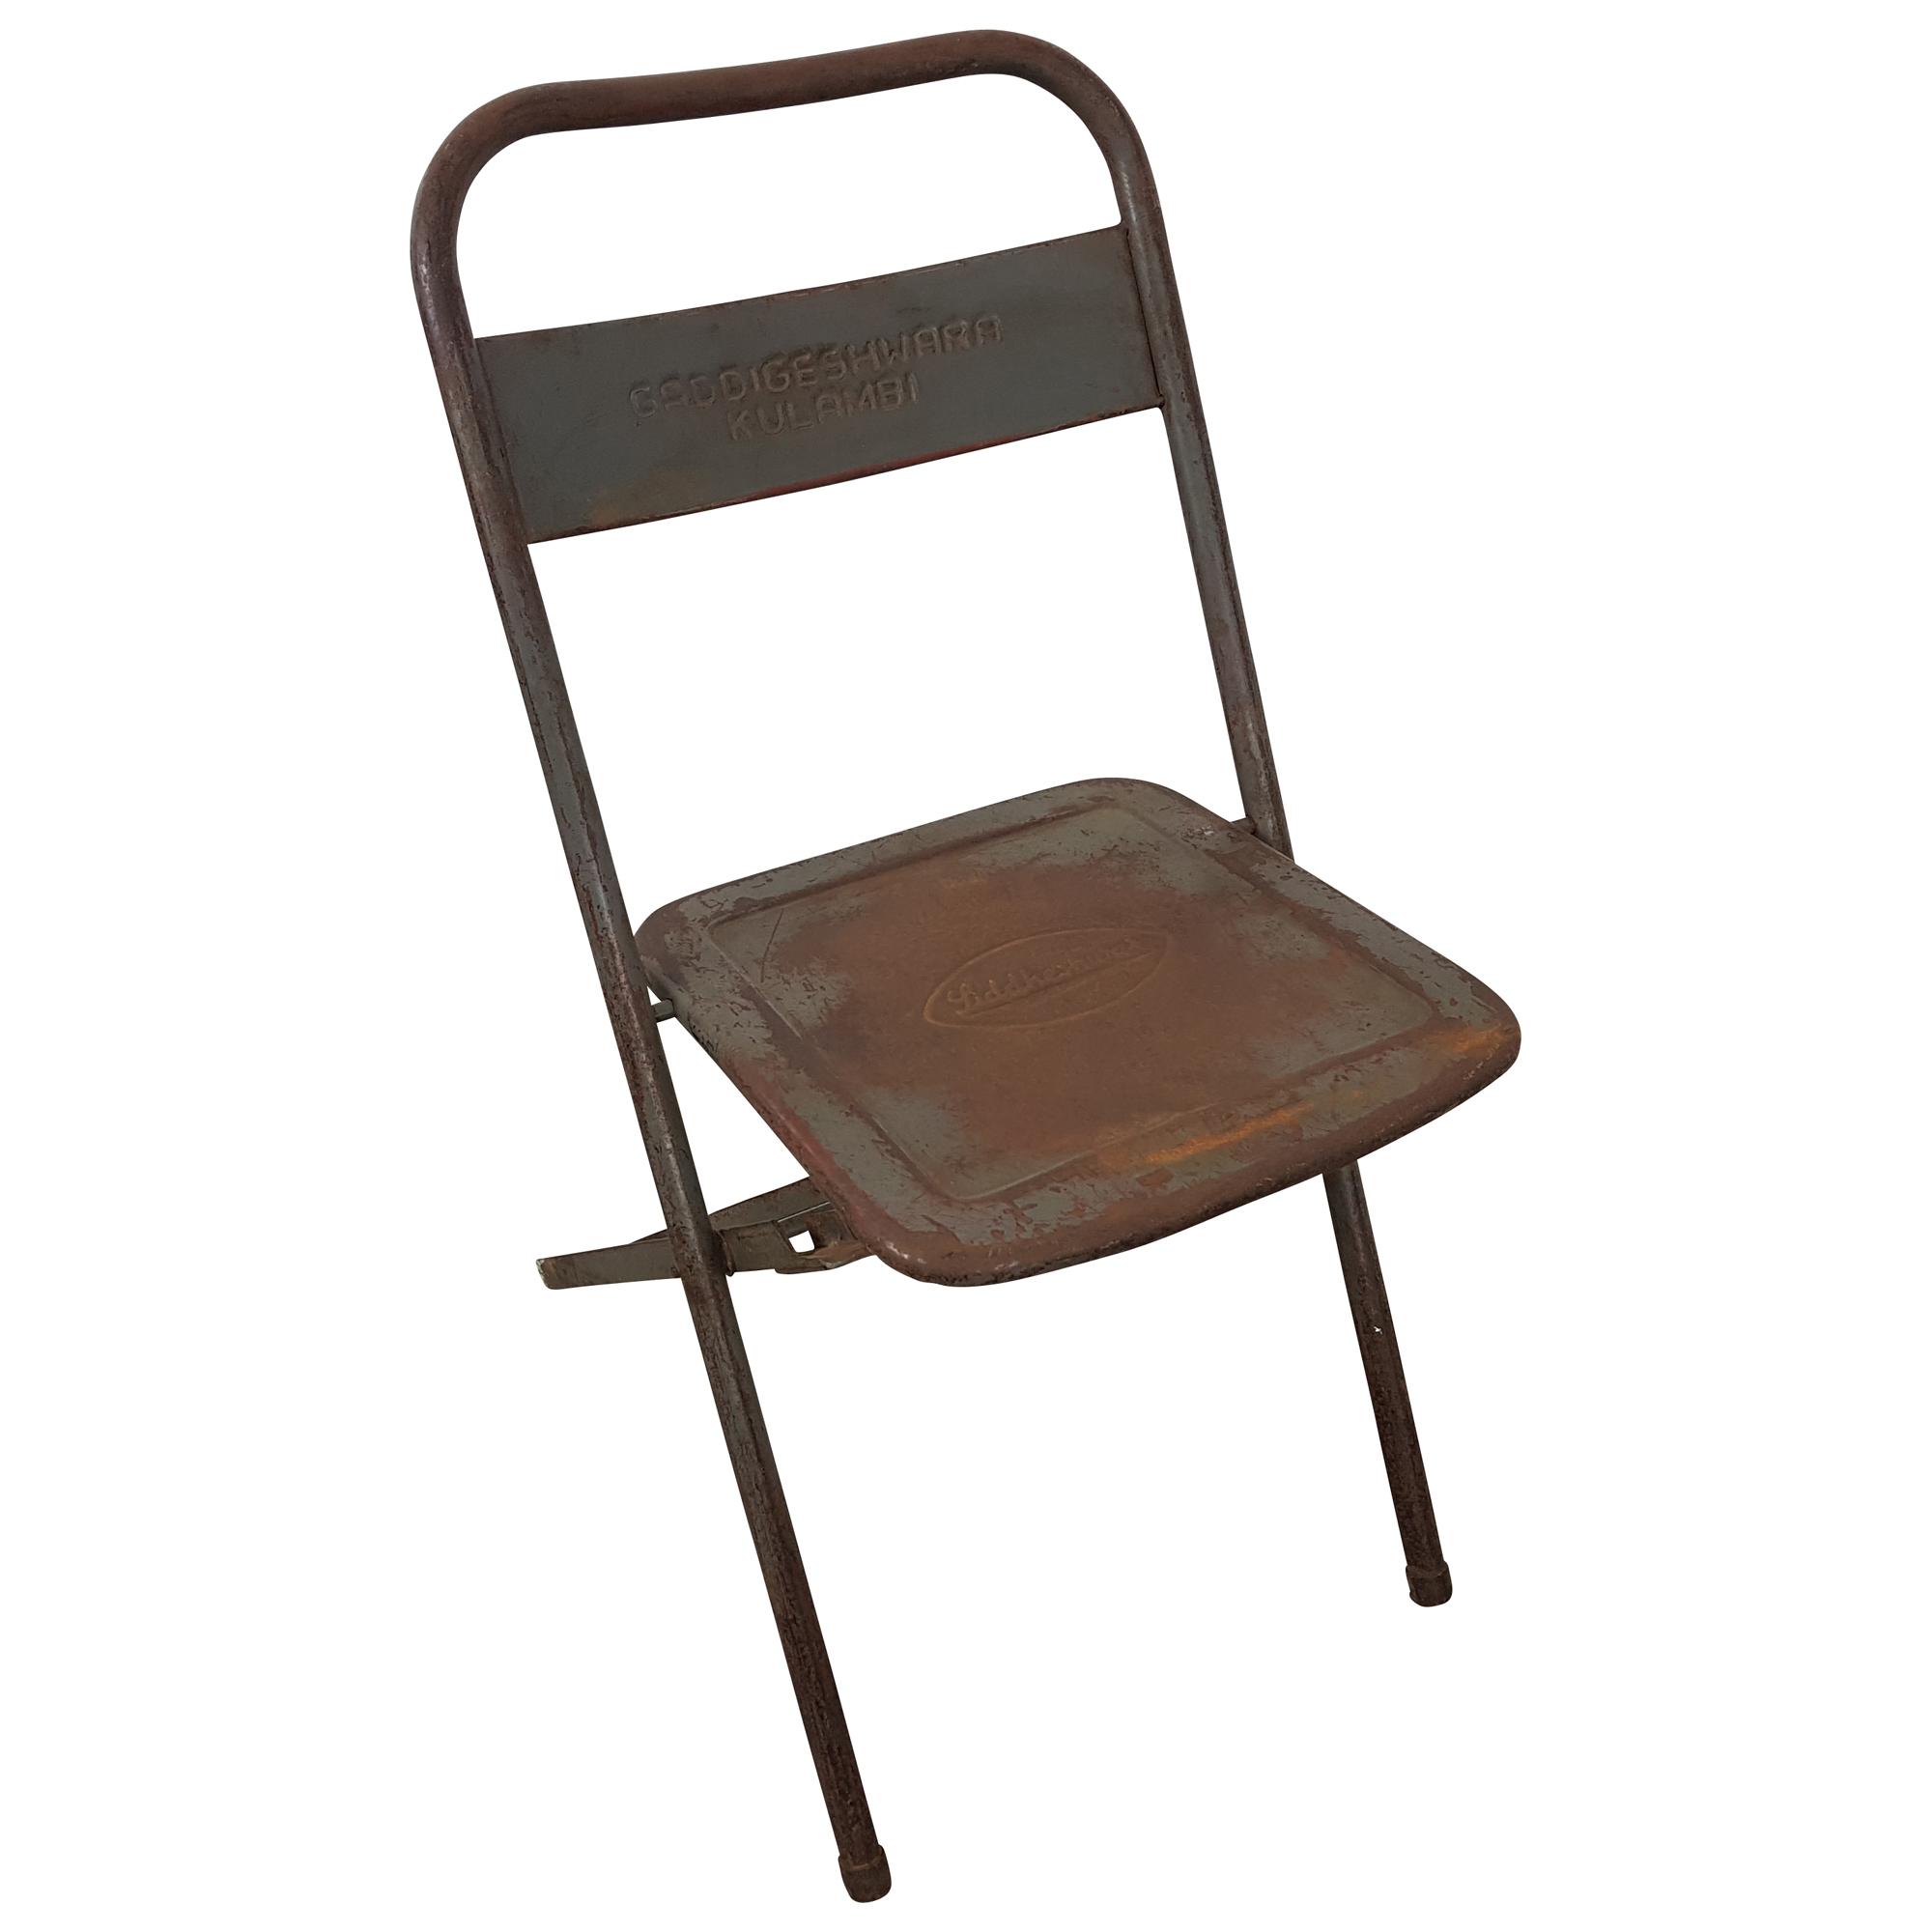 Klappstuhl Metall Stuhl Gastro Bistro Industrial Style